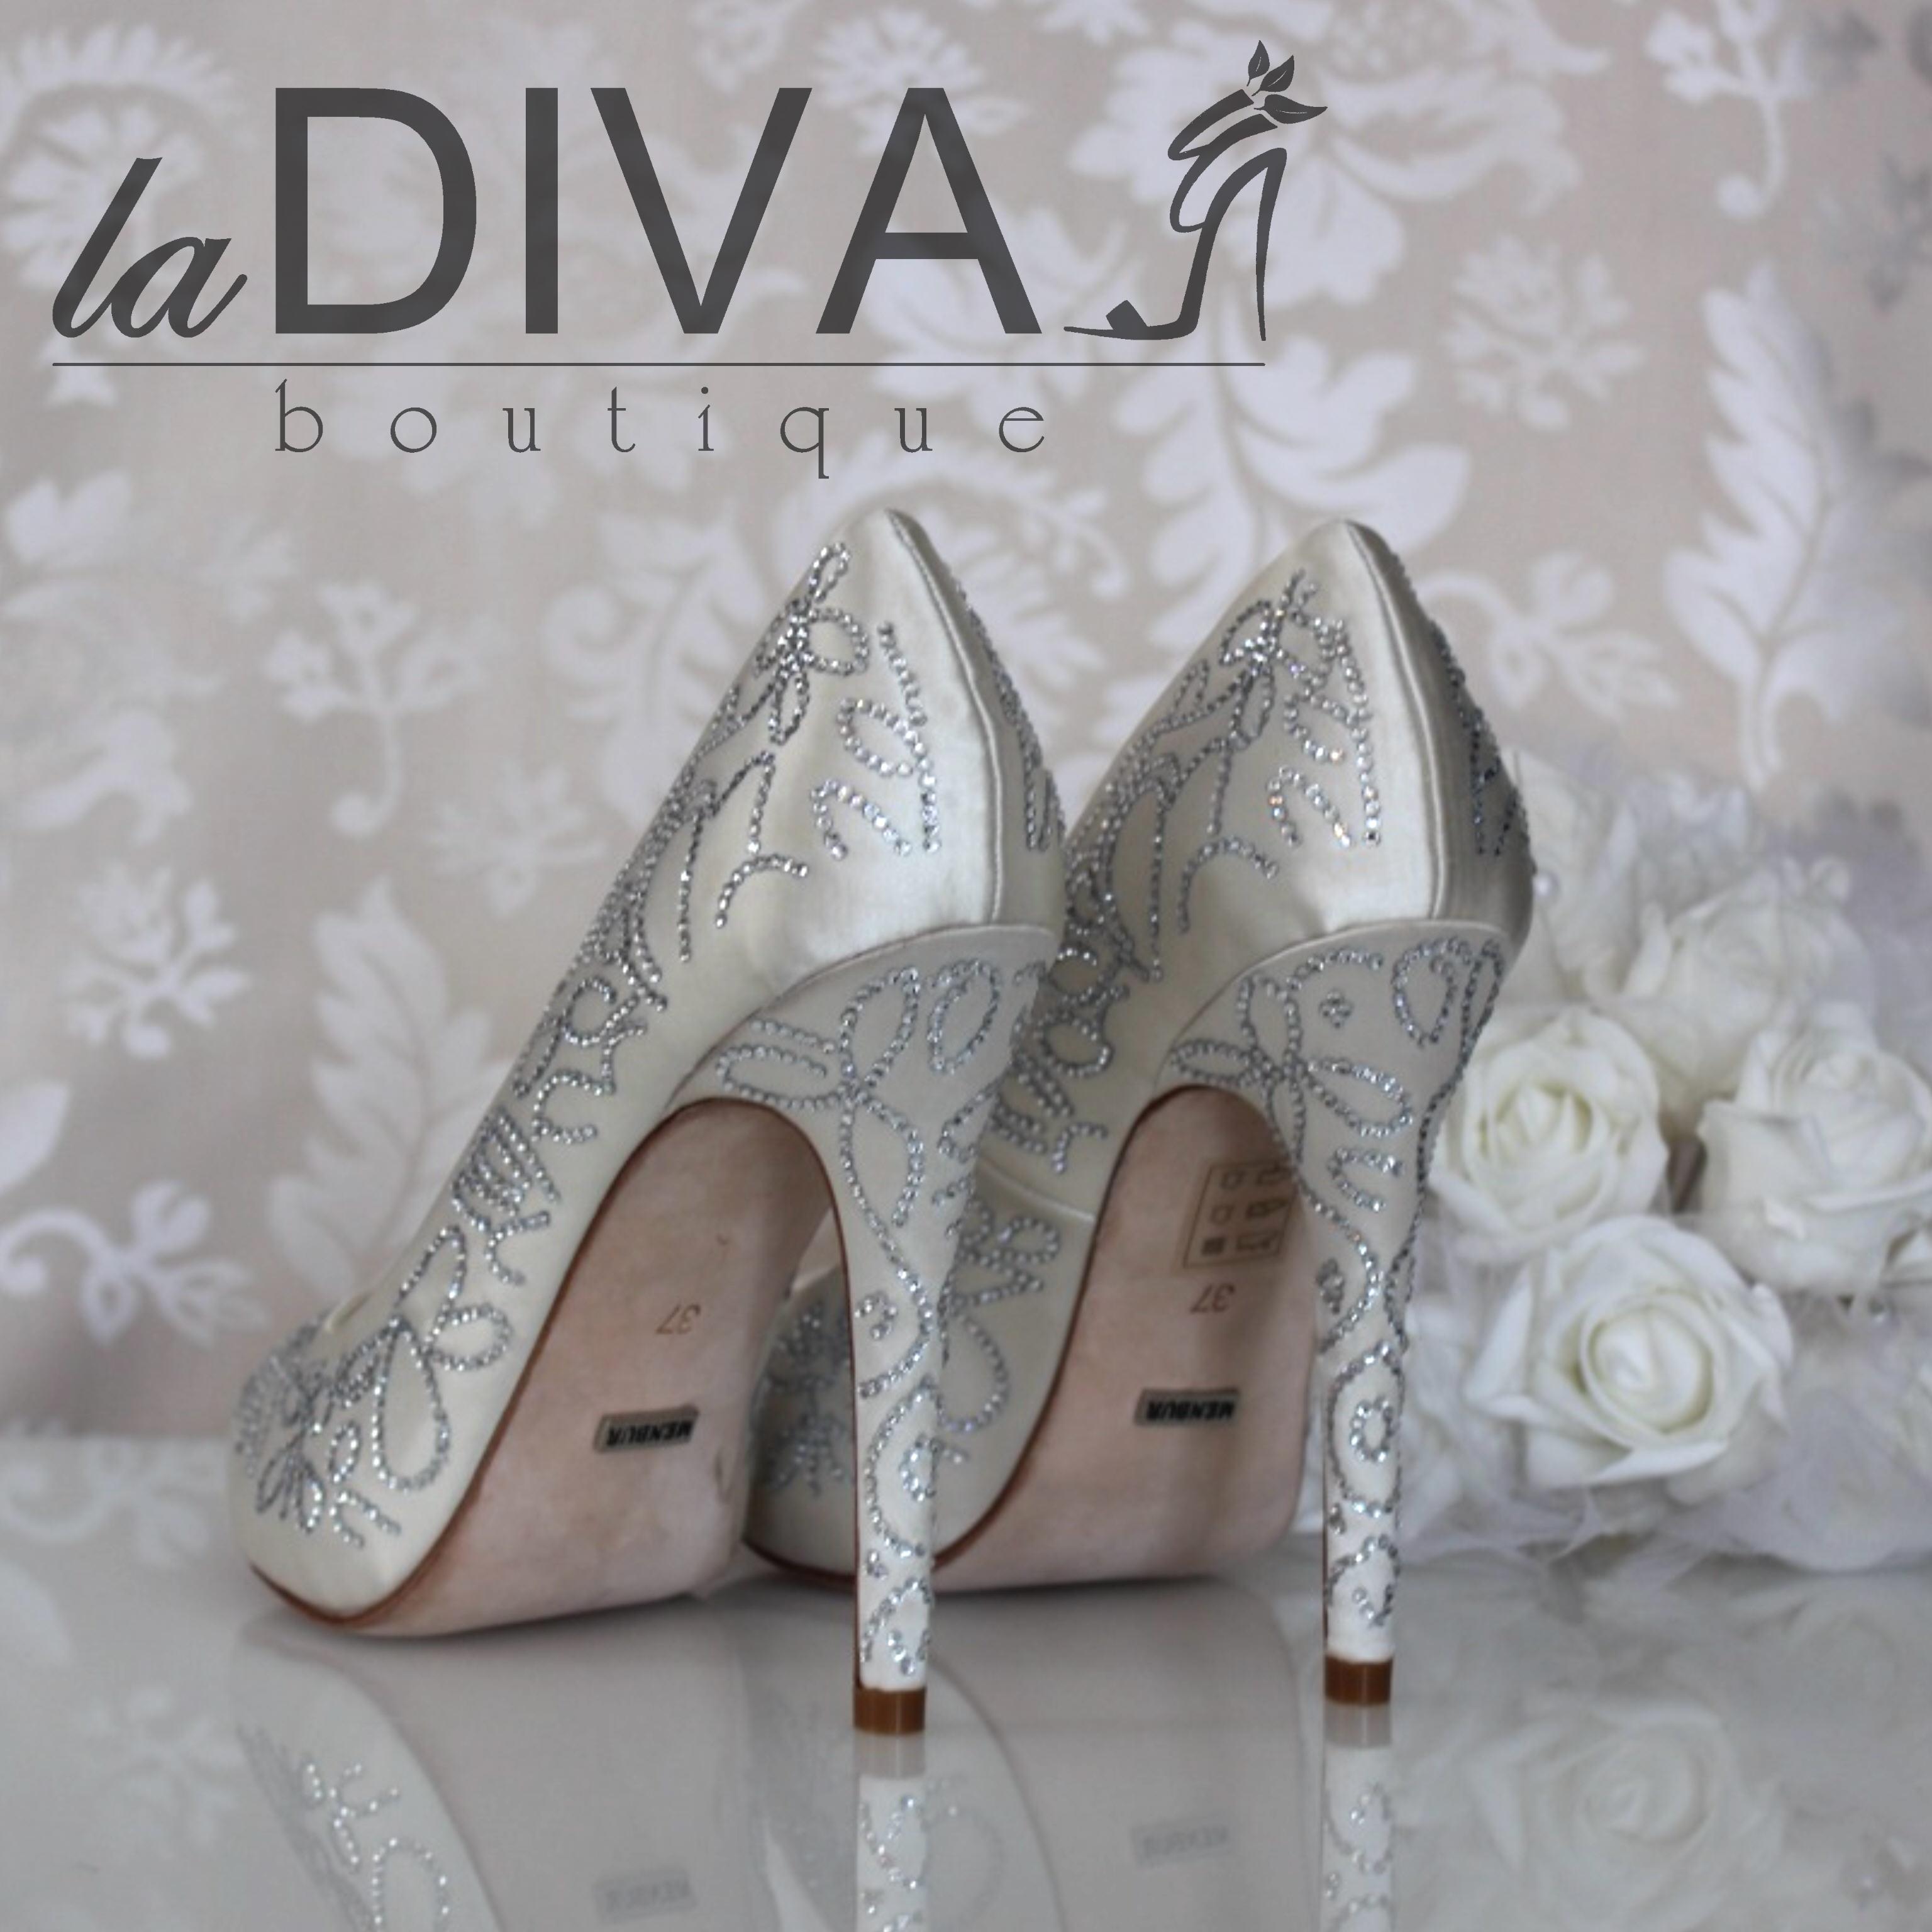 menbur wedding strass peep toe pumps brautschuhe ivory. Black Bedroom Furniture Sets. Home Design Ideas